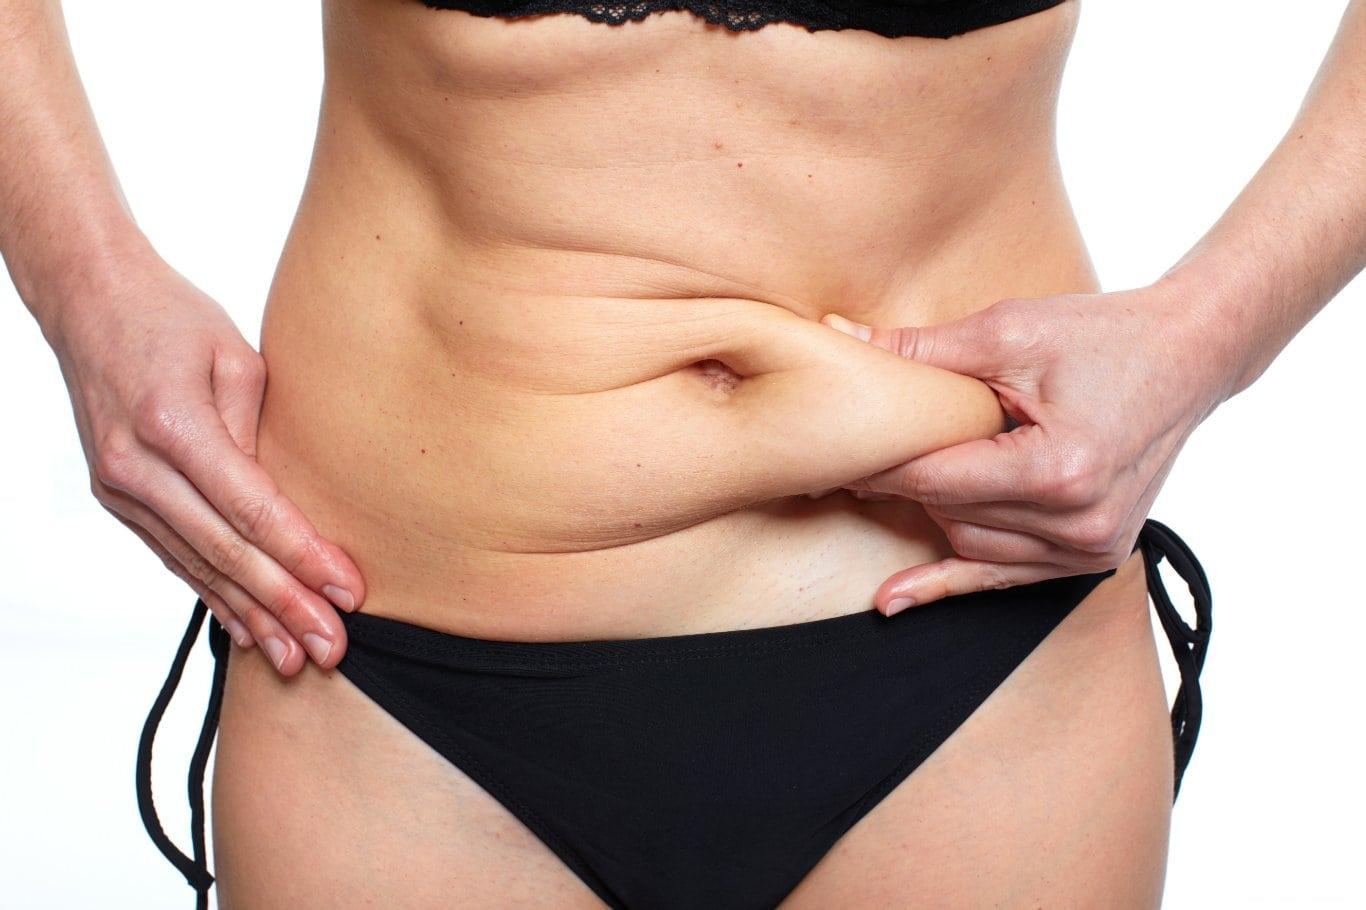 Medical Benefits of Tummy Tuck | Houston Plastic Surgery